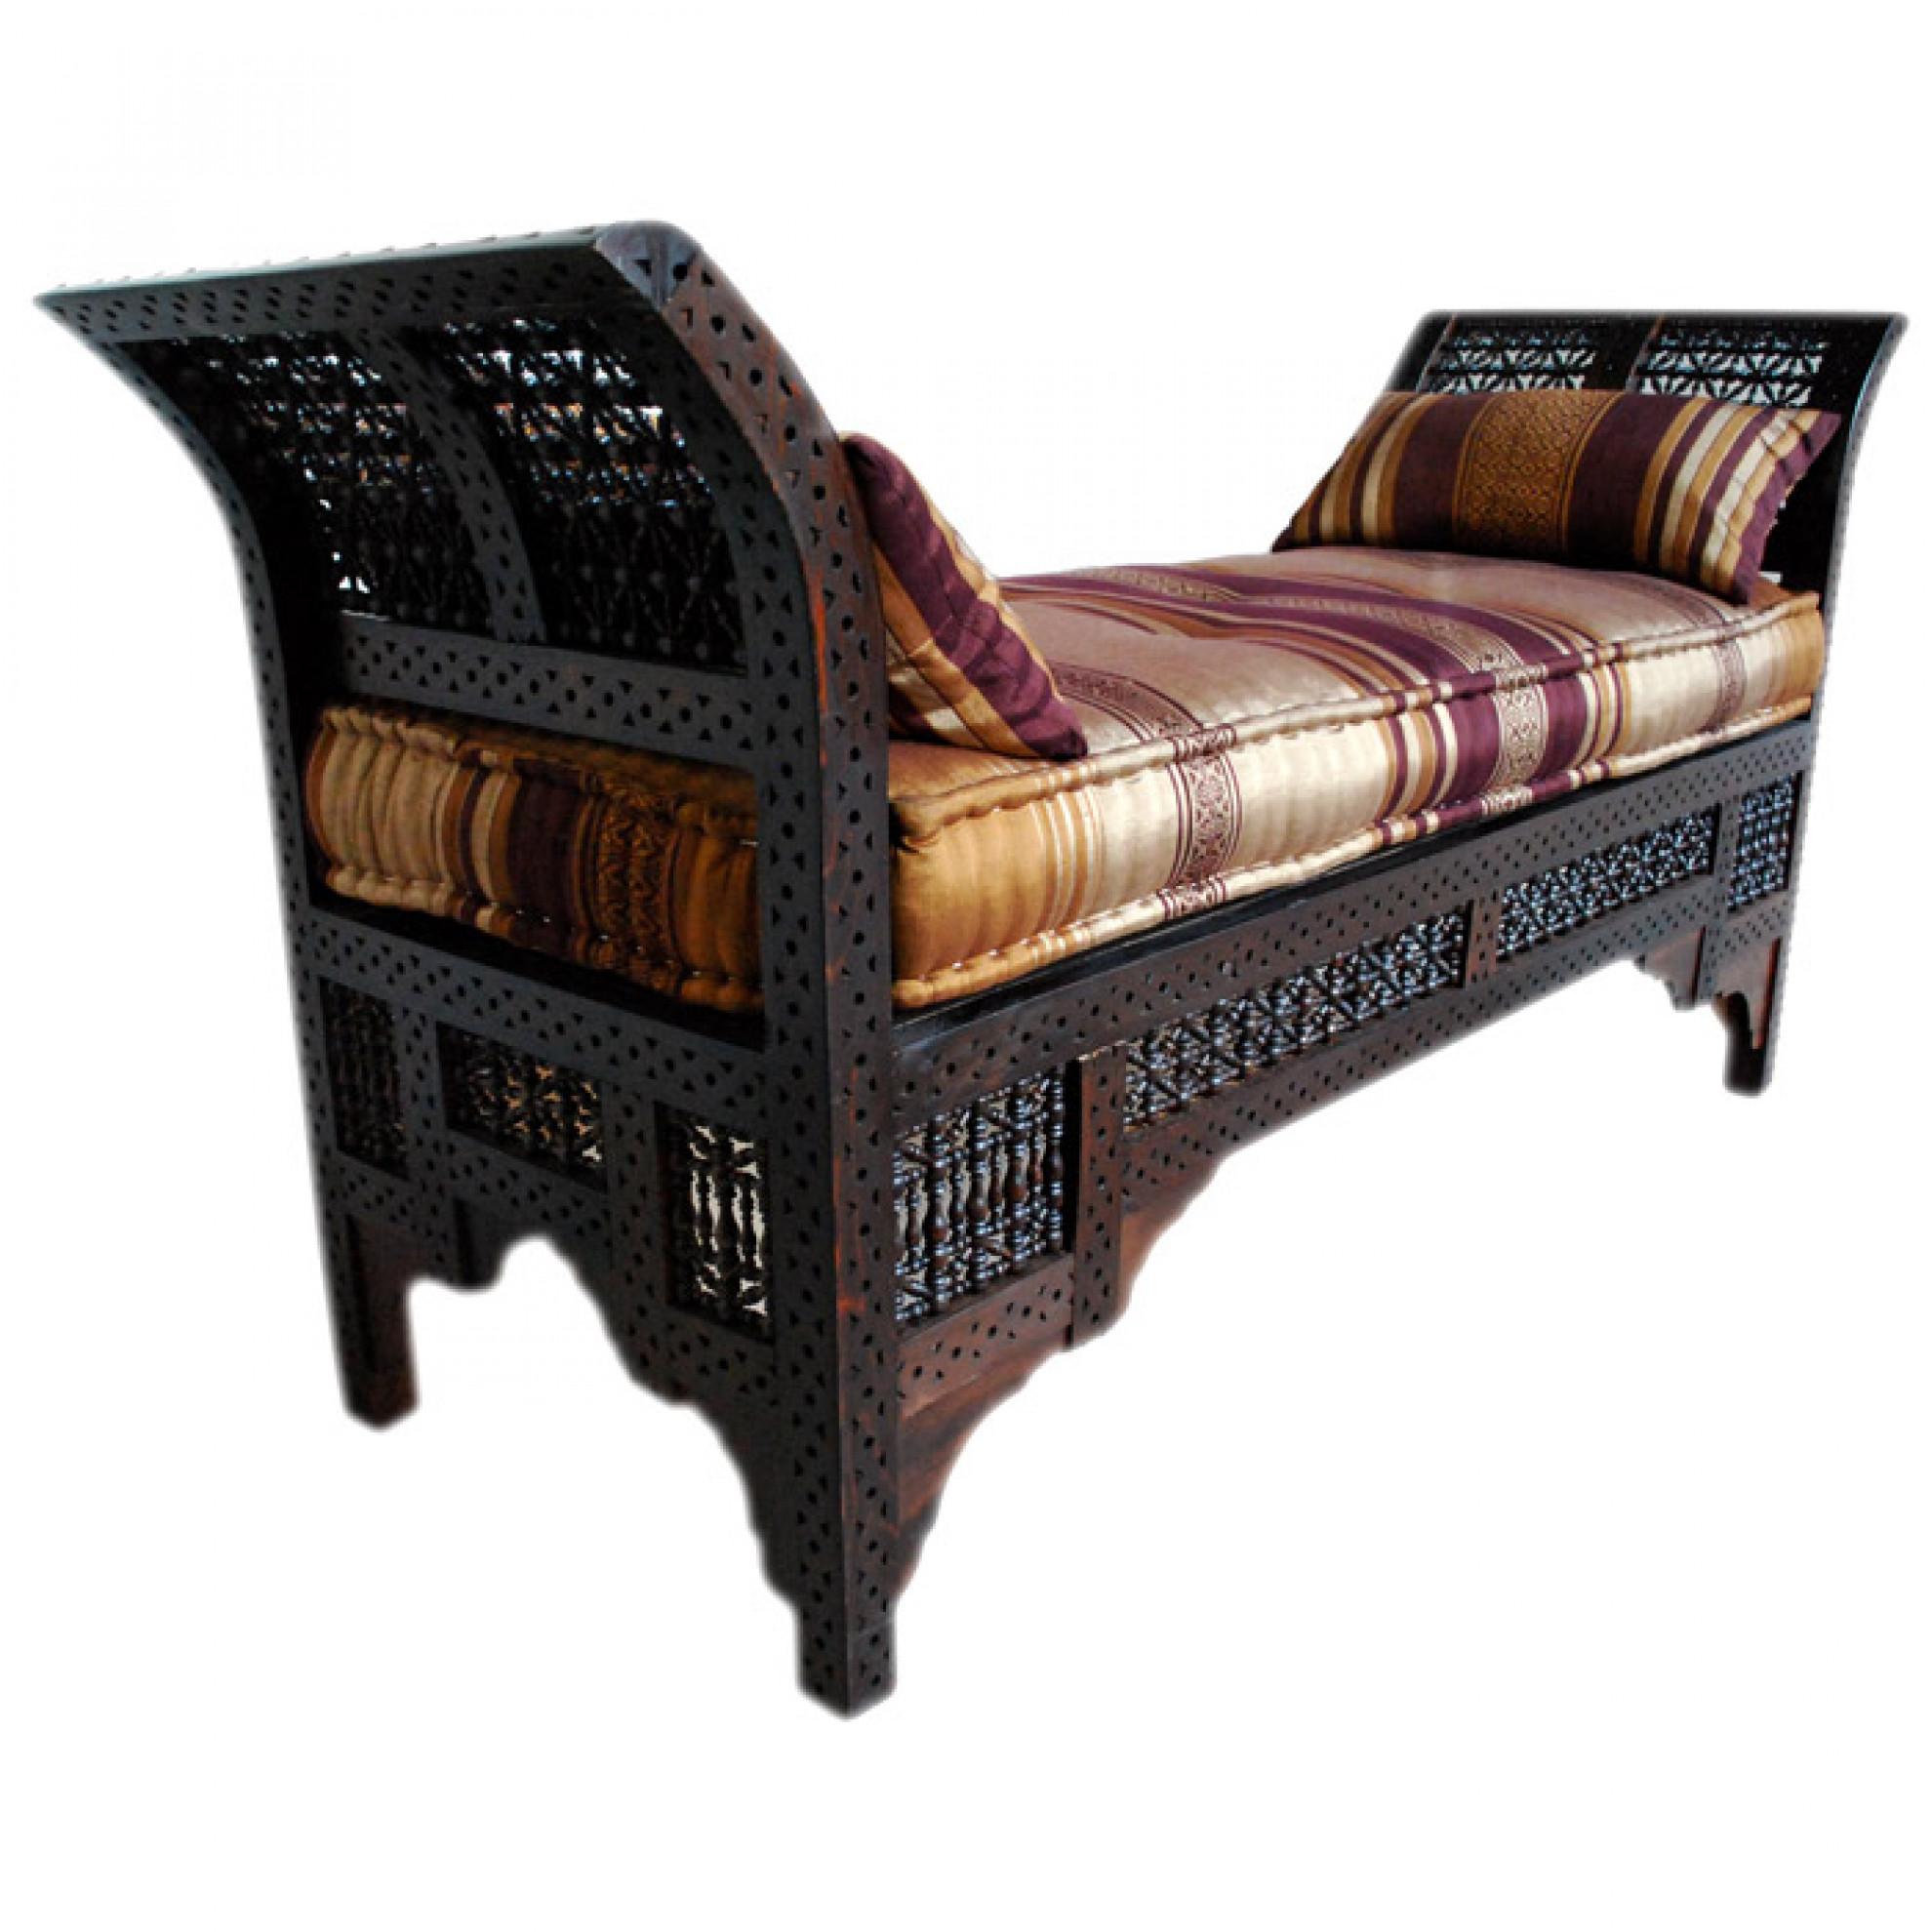 orientalische couch fantasia. Black Bedroom Furniture Sets. Home Design Ideas